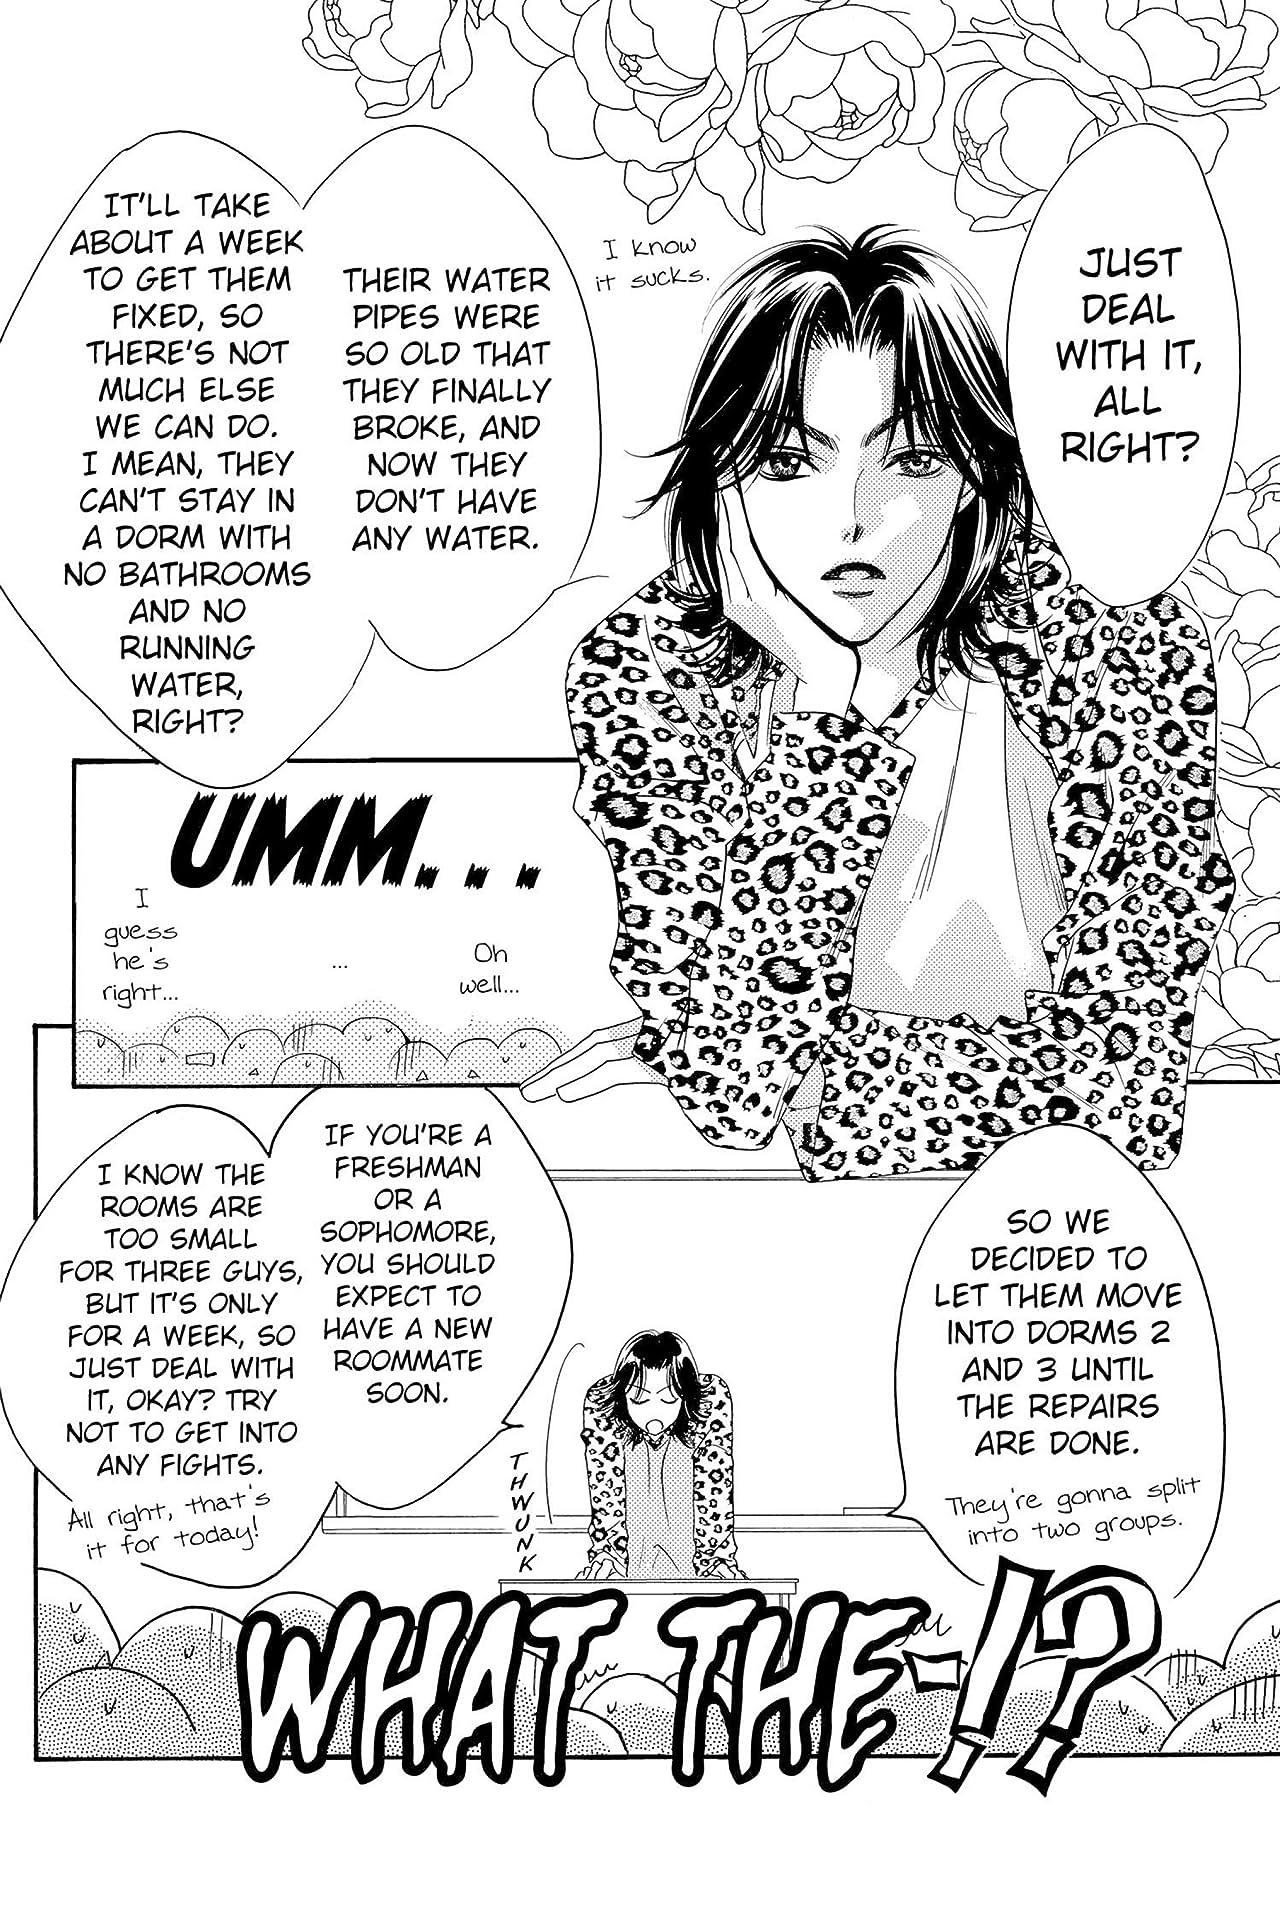 Hana-Kimi Vol. 14